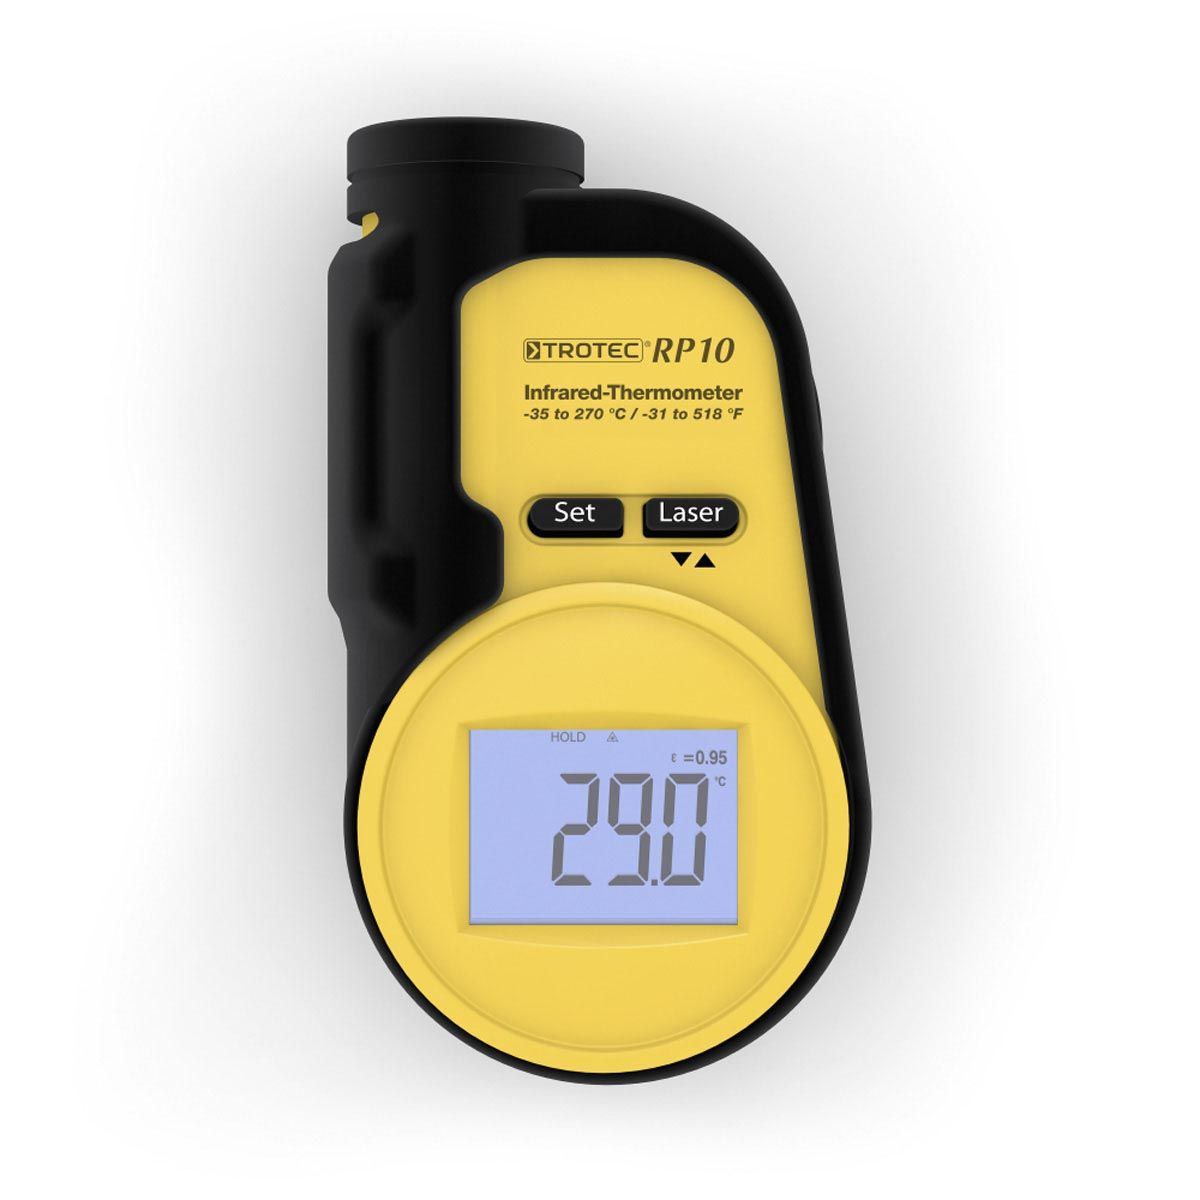 Thermomètre infrarouge, RP10, noir, 53 x 97 x 25 mm